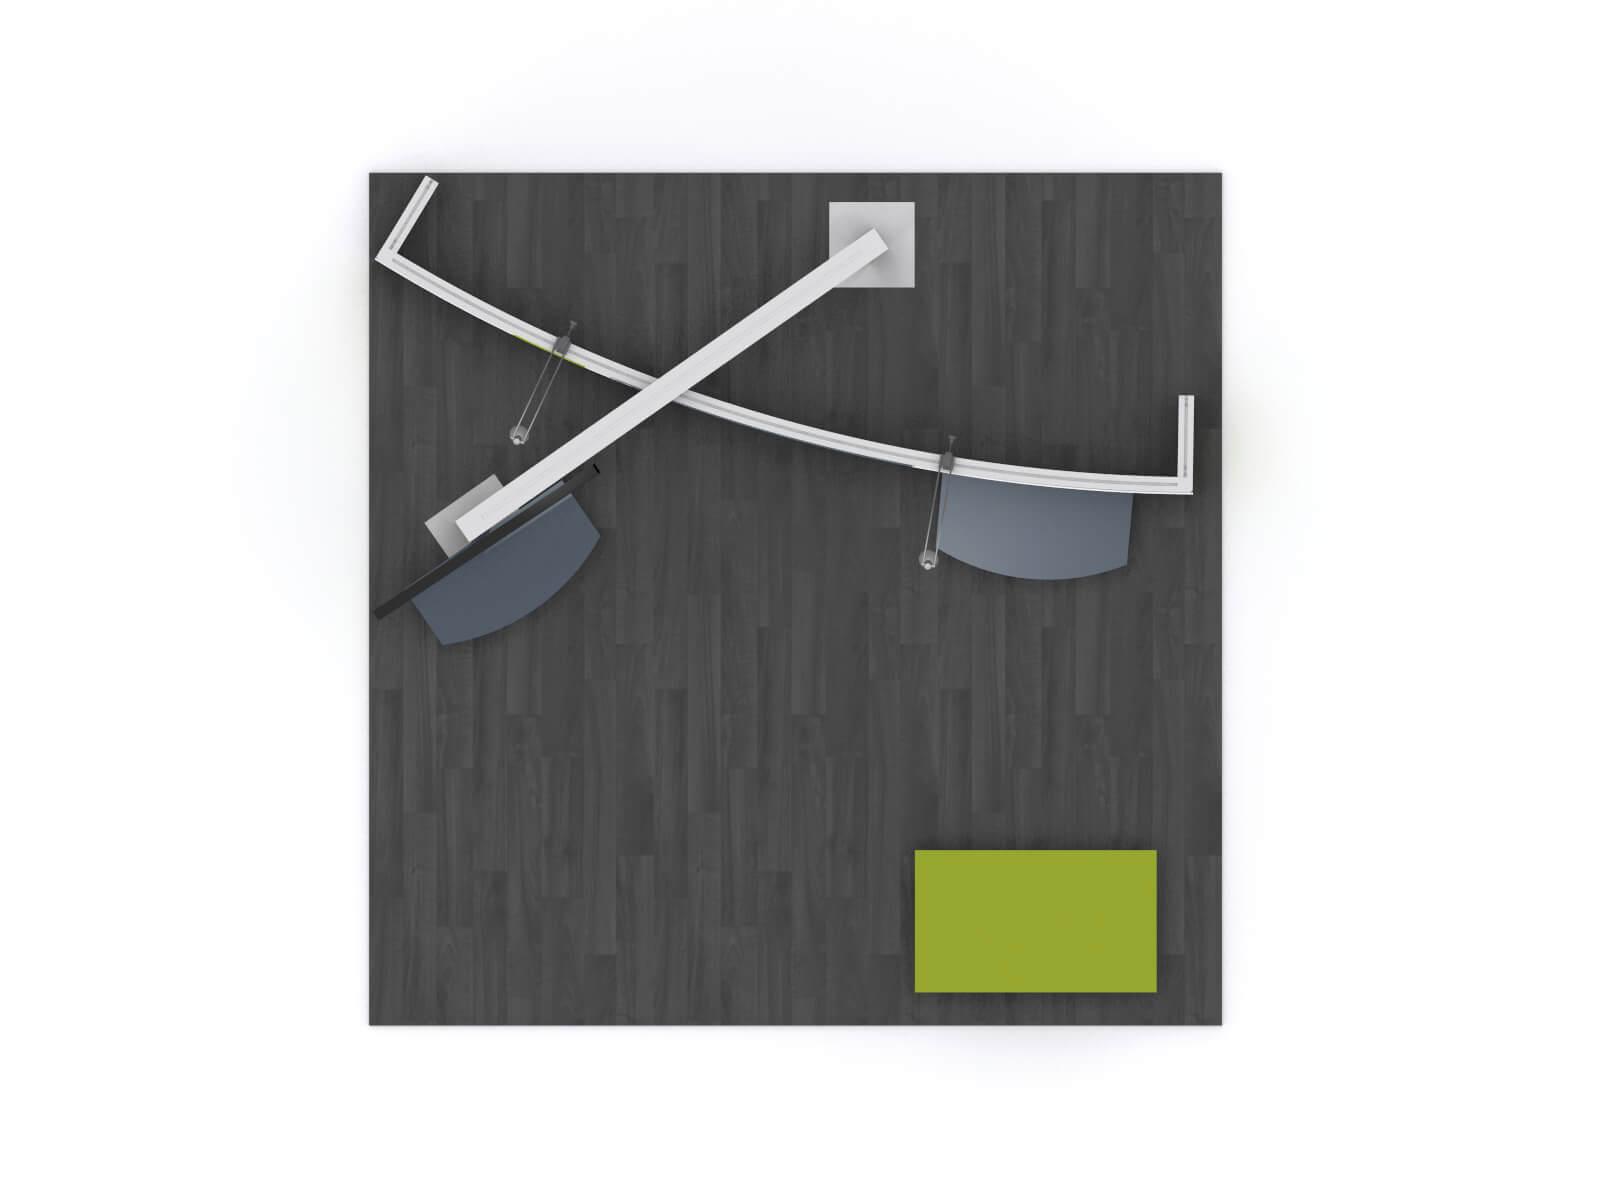 GK-1011 Gravitee Inline - plan view